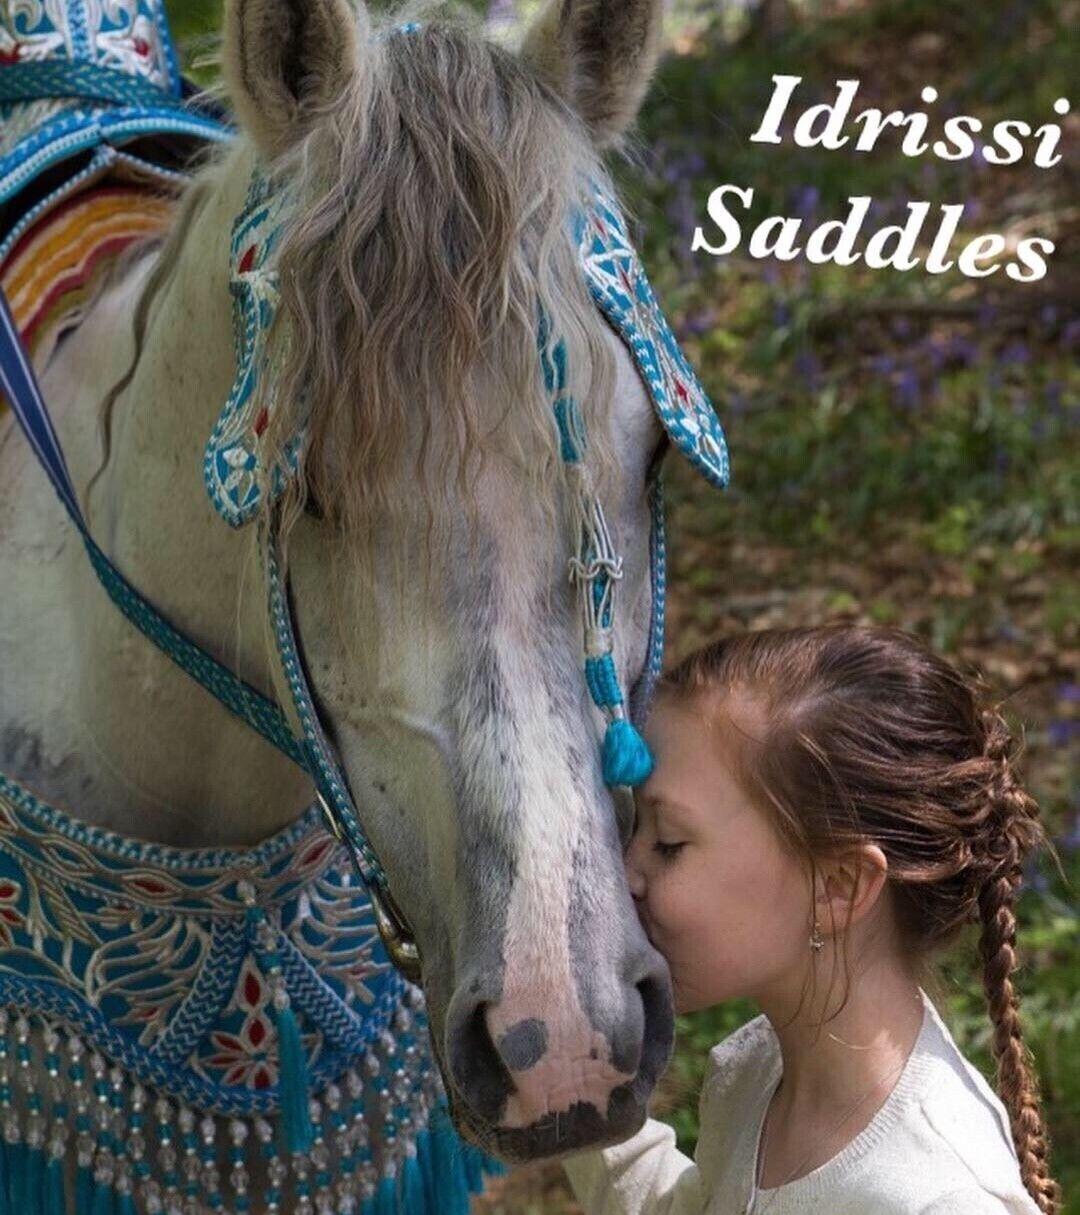 Harnachement saddles selle tborida  handcraft moroccanhandmade royal saddles  sin mínimo